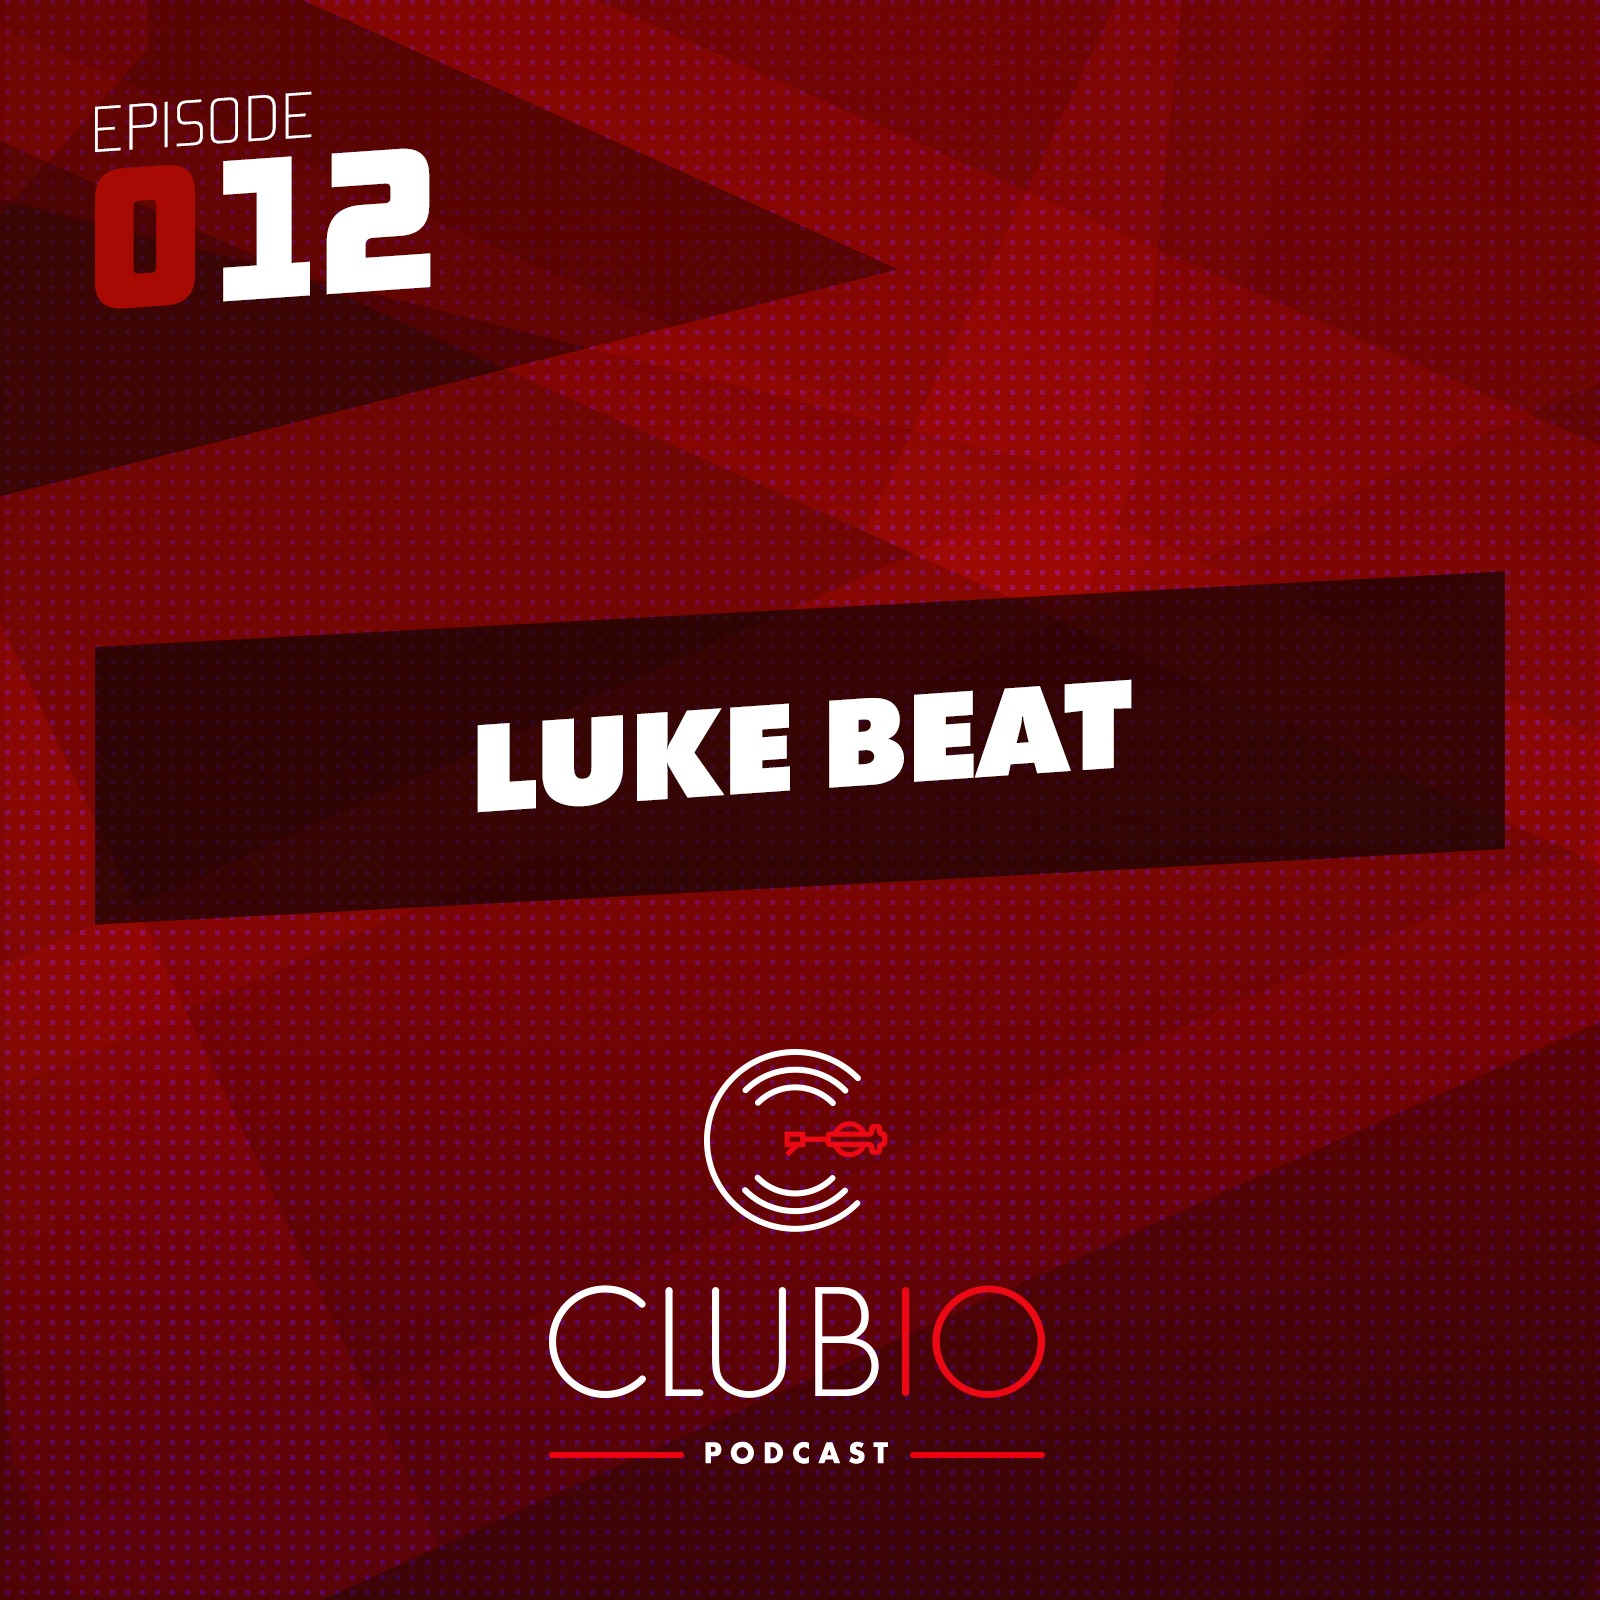 Clubio Podcast 012 - Luke Beat